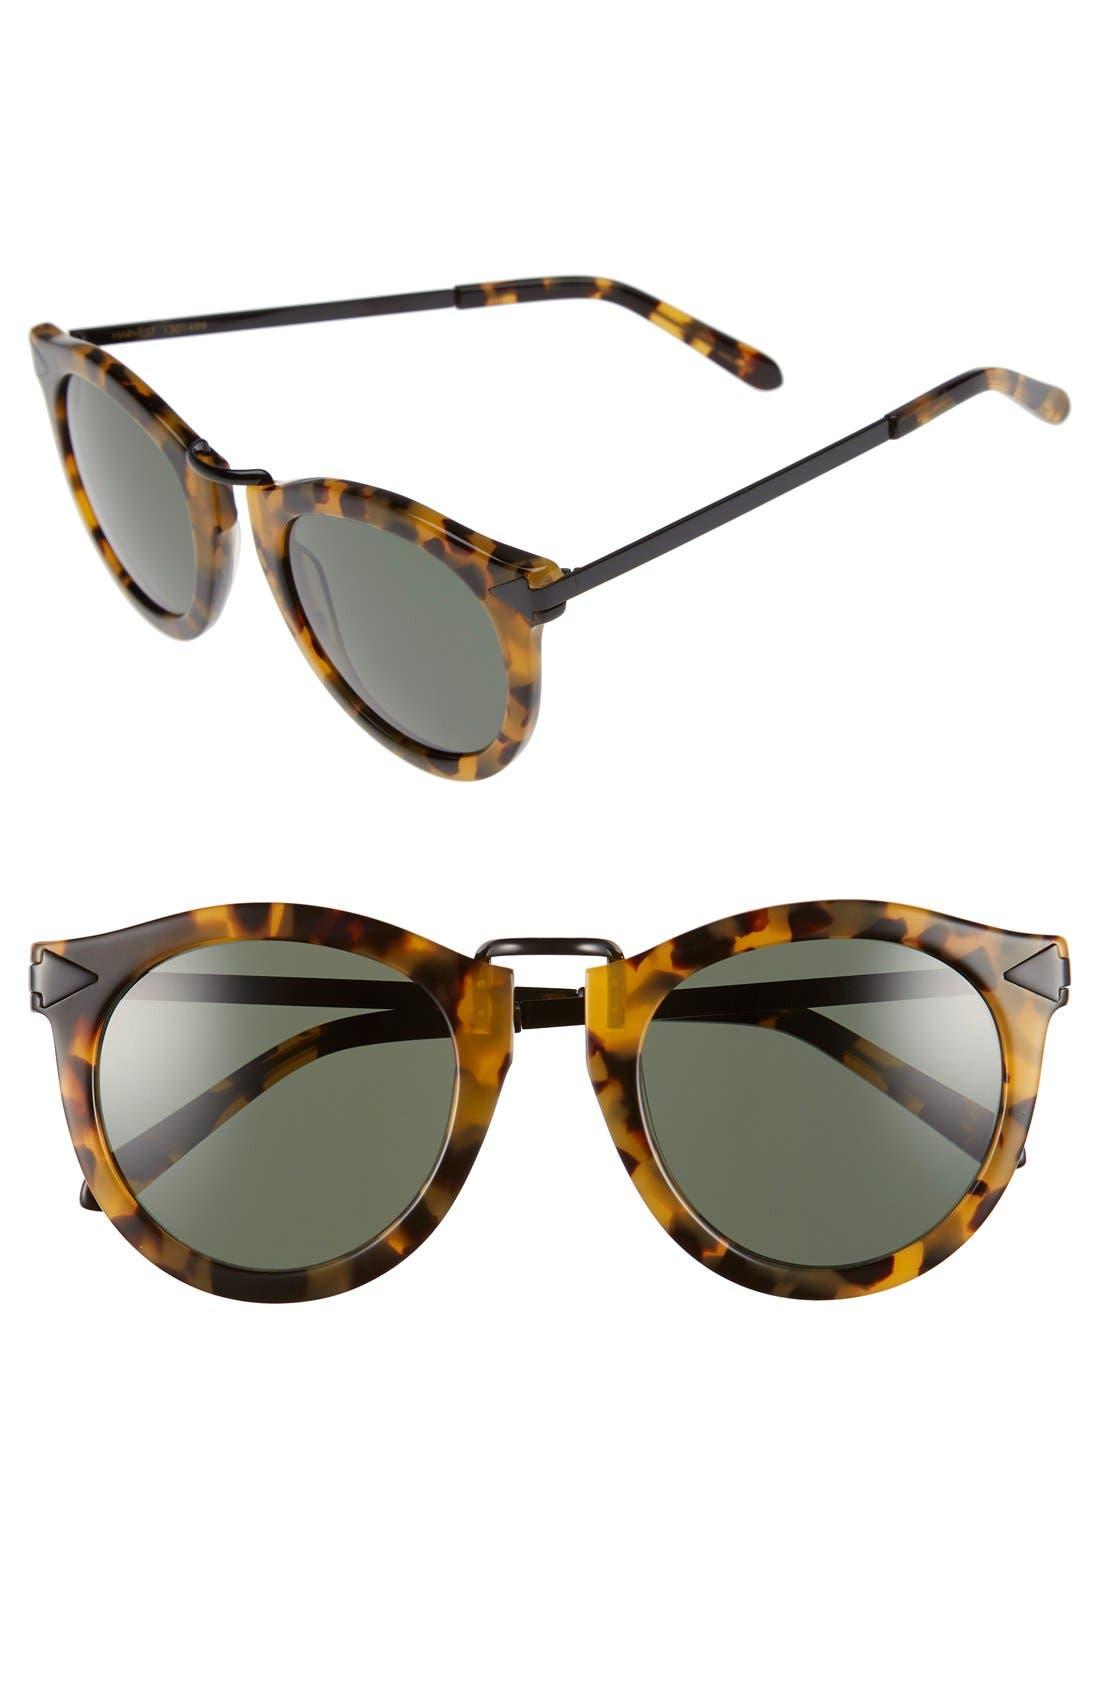 Alternate Image 1 Selected - Karen Walker 'Harvest' 50mm Sunglasses